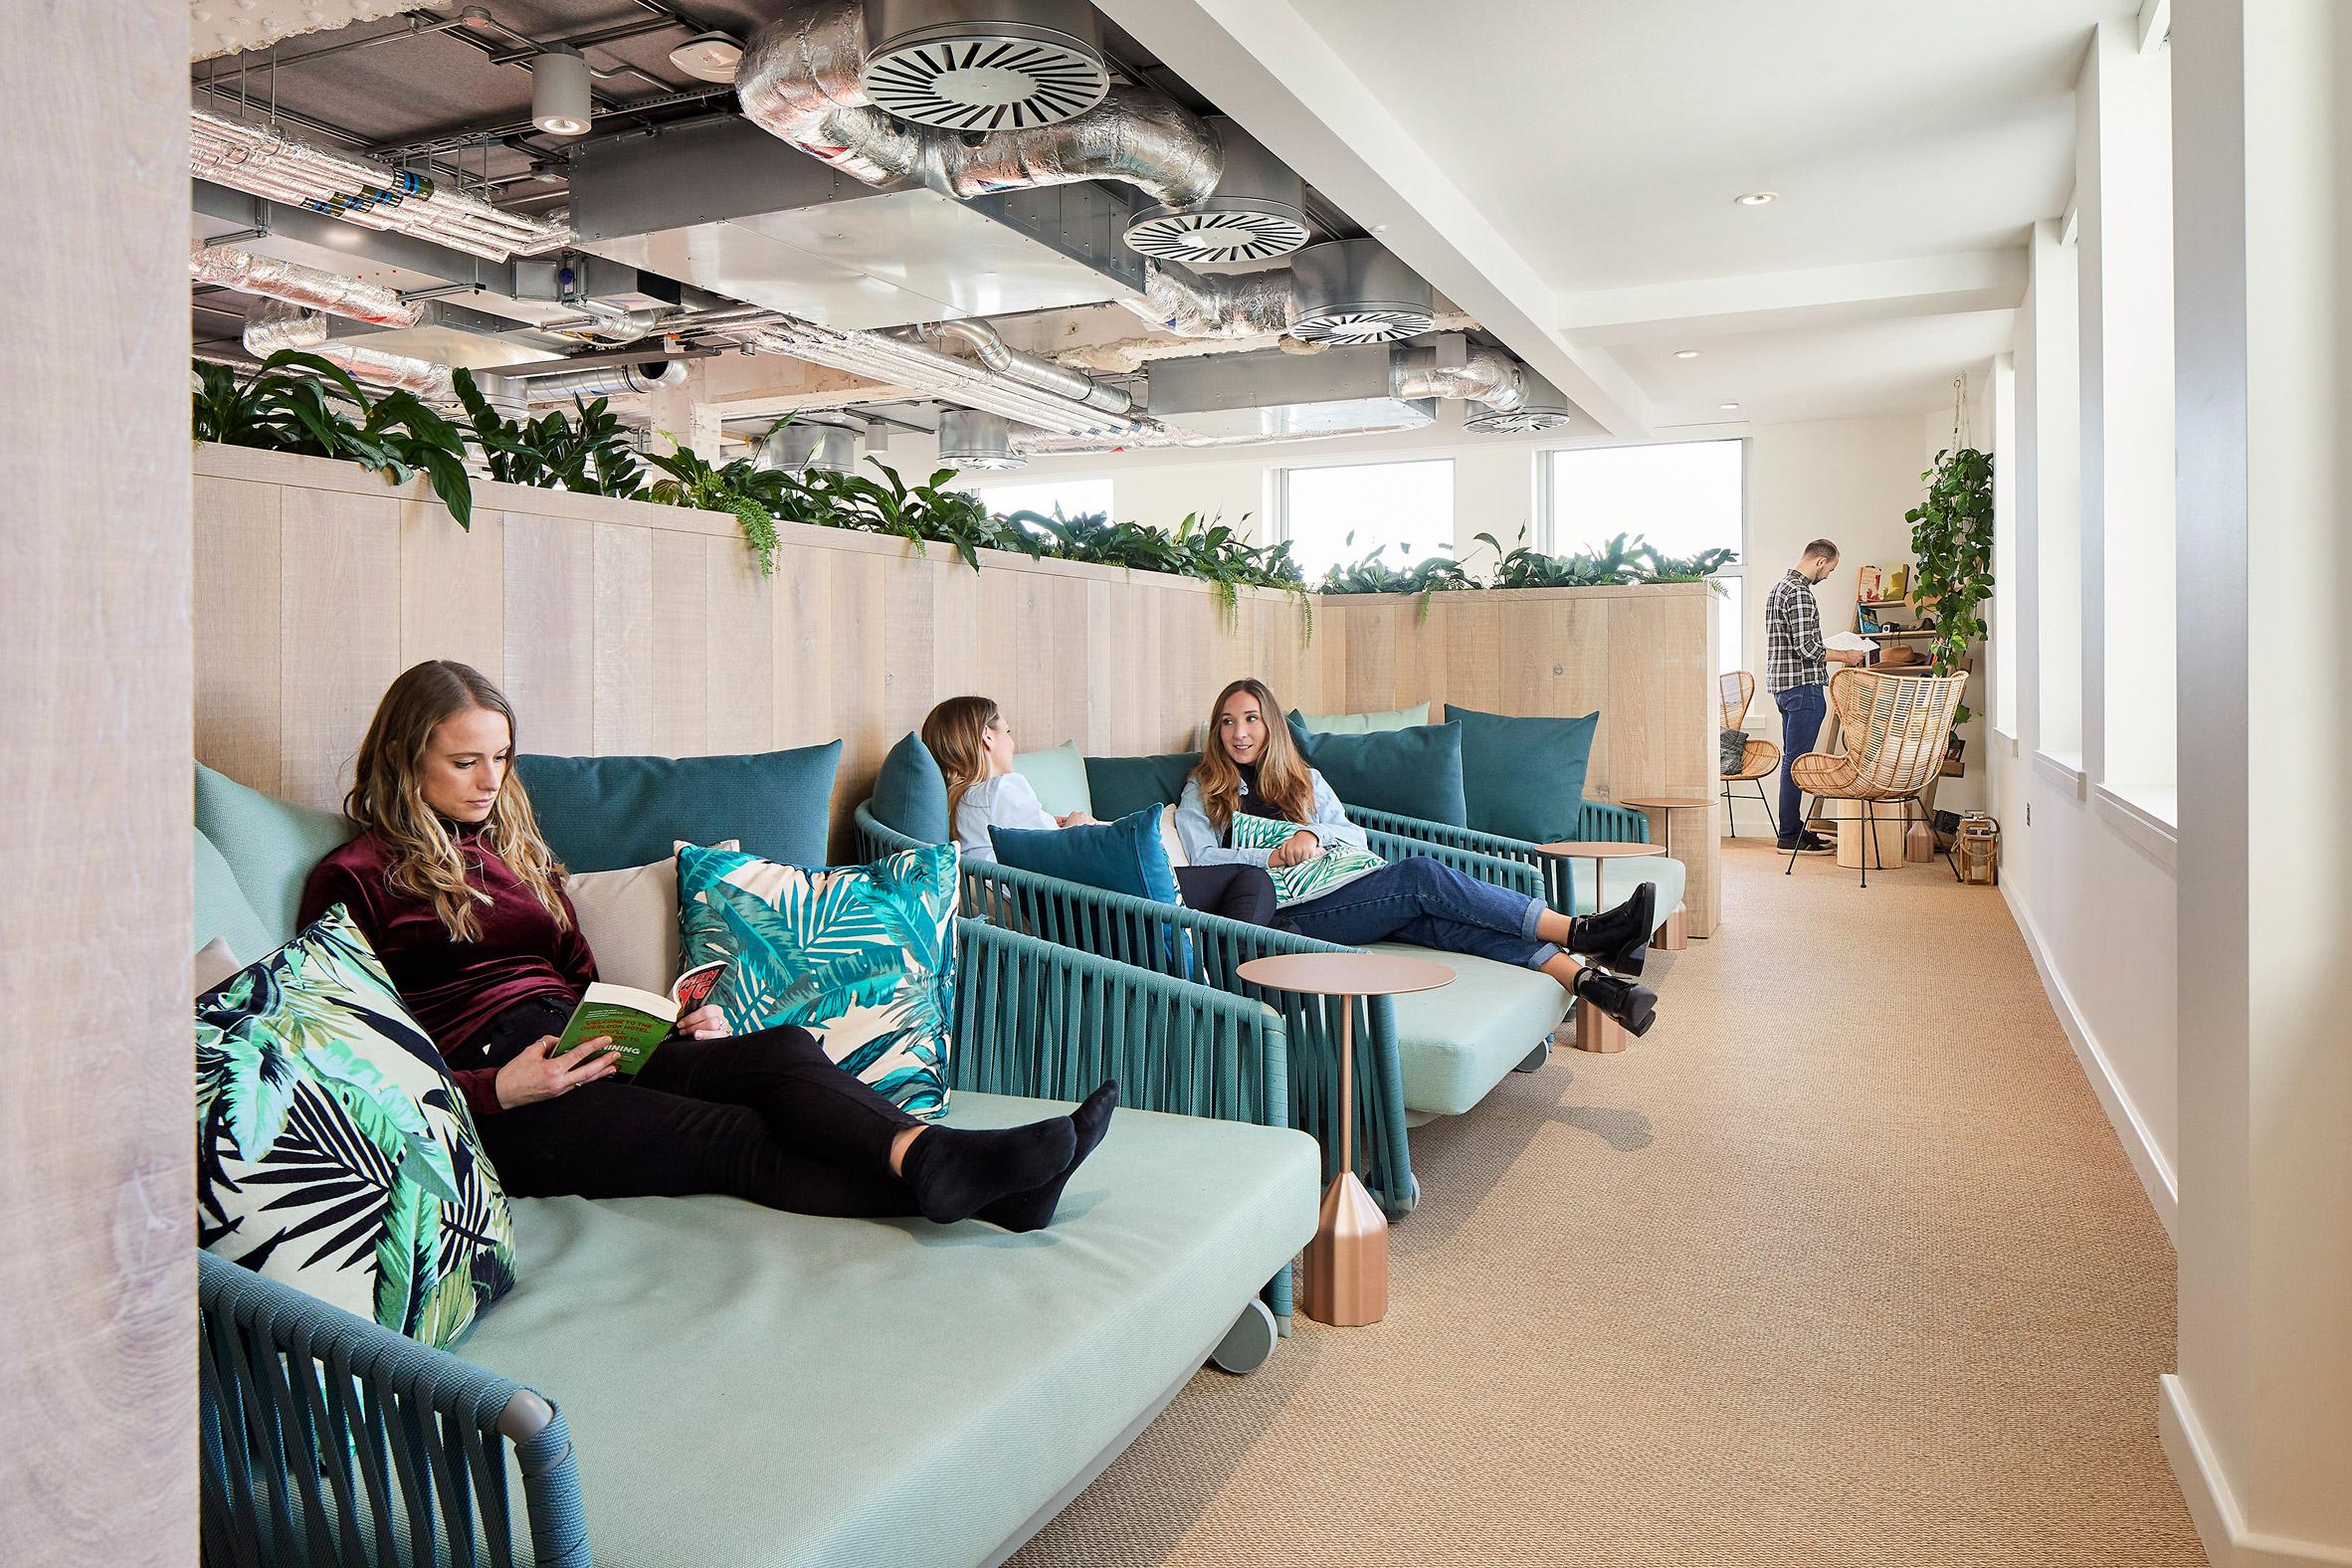 Spotify's London office